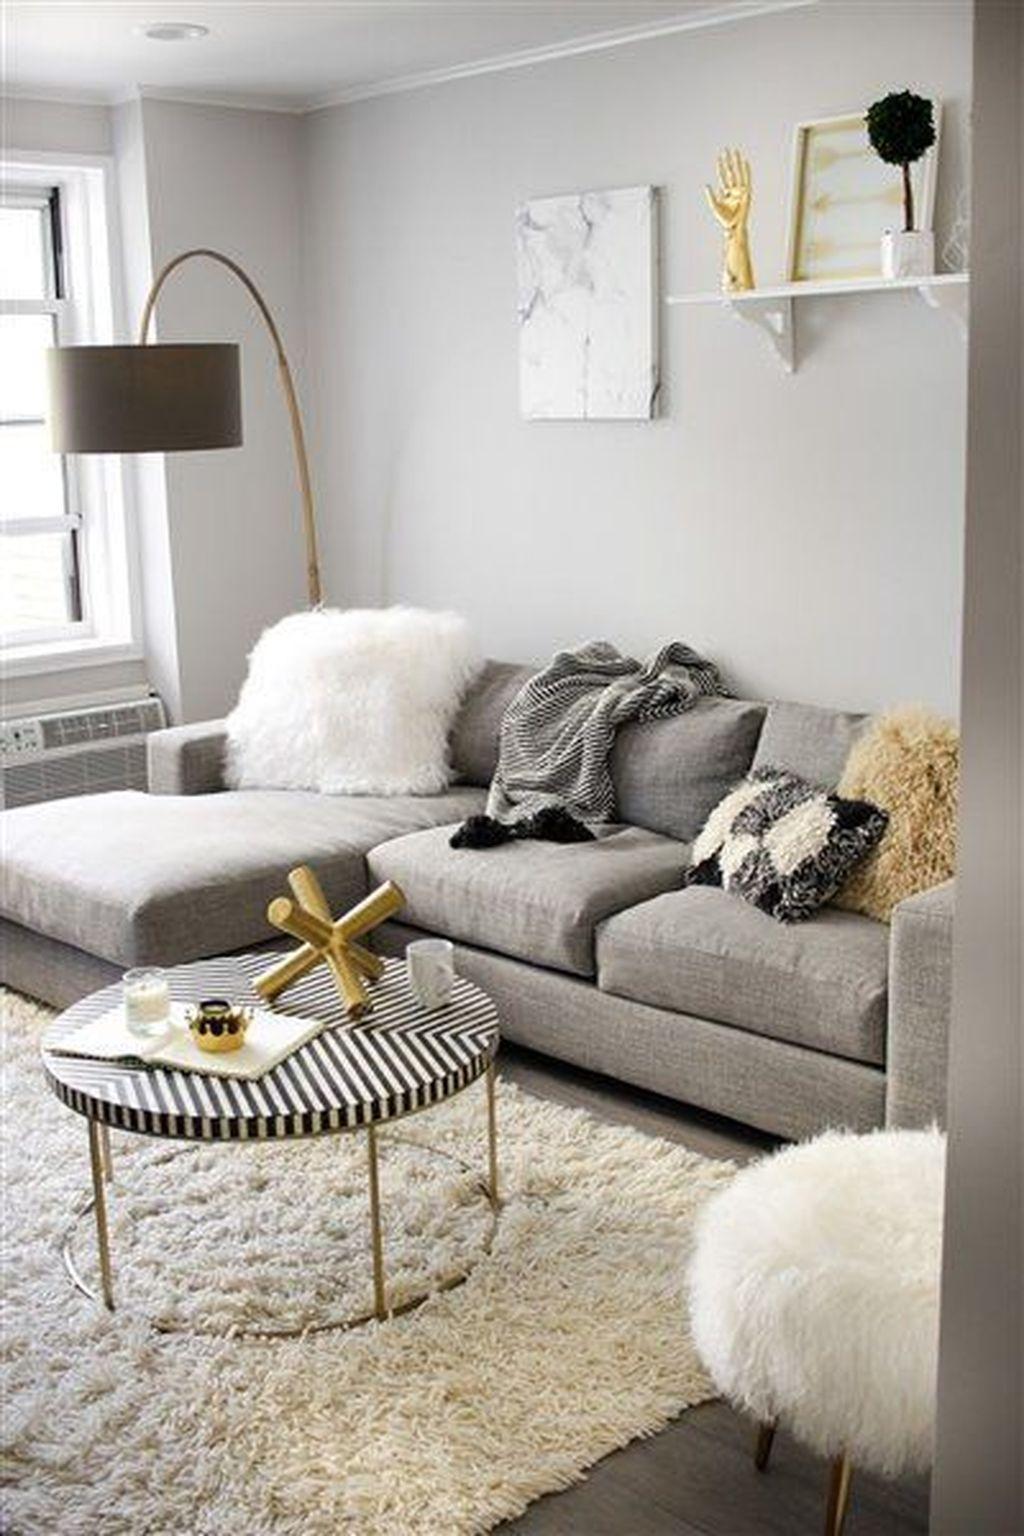 Cool 48 Smart Small Living Room Decor Ideas More At Https Homishome Com 2019 0 Small Living Room Decor Apartment Decorating Livingroom Apartment Living Room